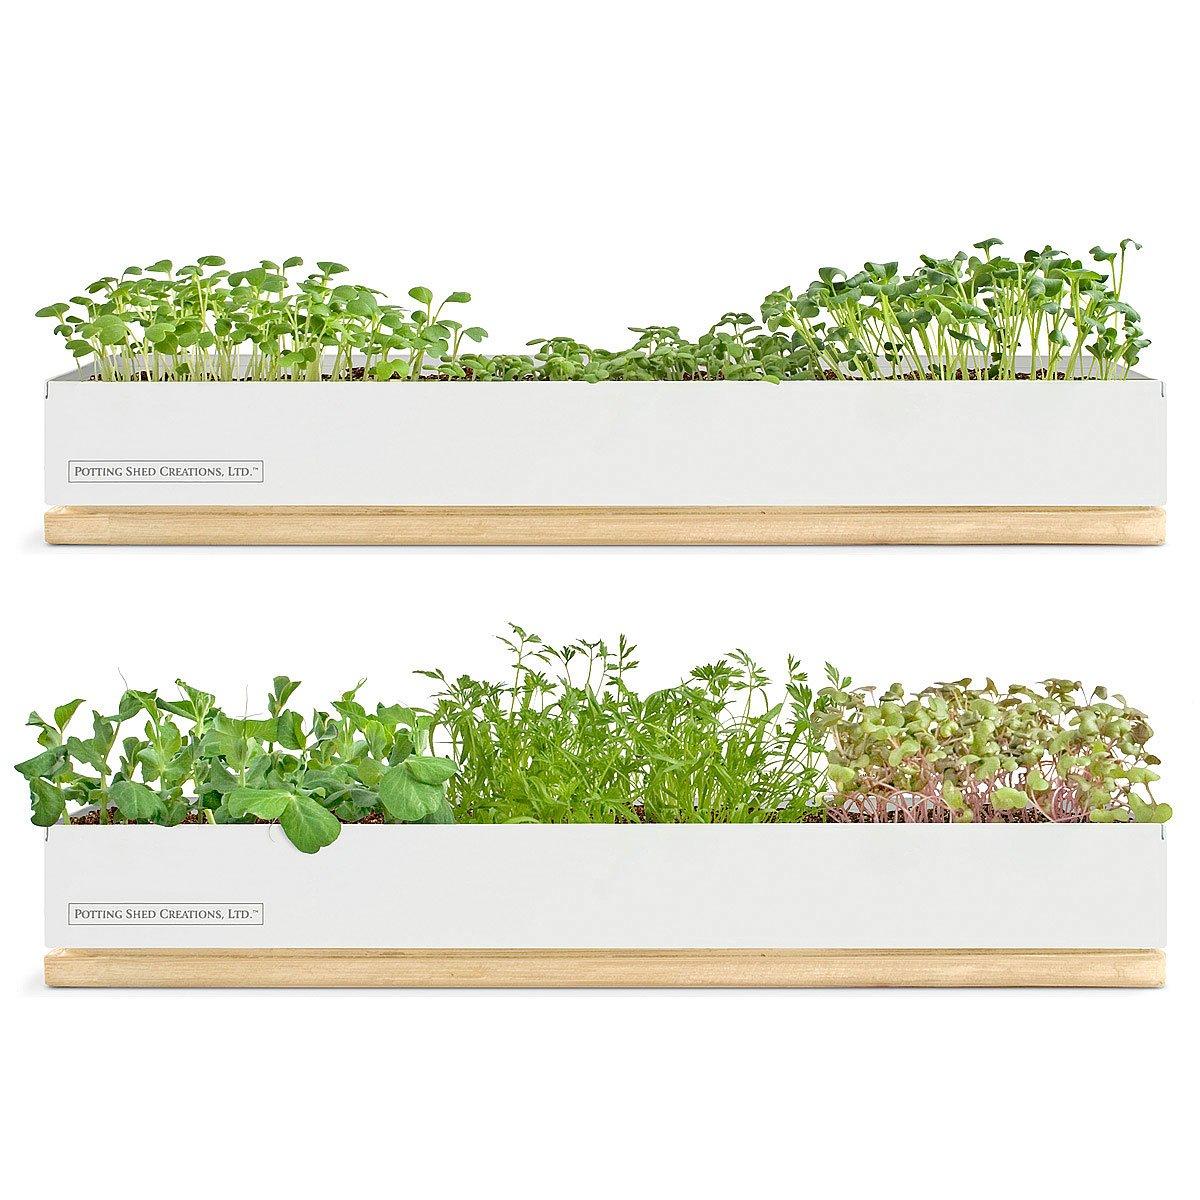 MicroGreen Kits Growing Kit Sprouting Kit UncommonGoods